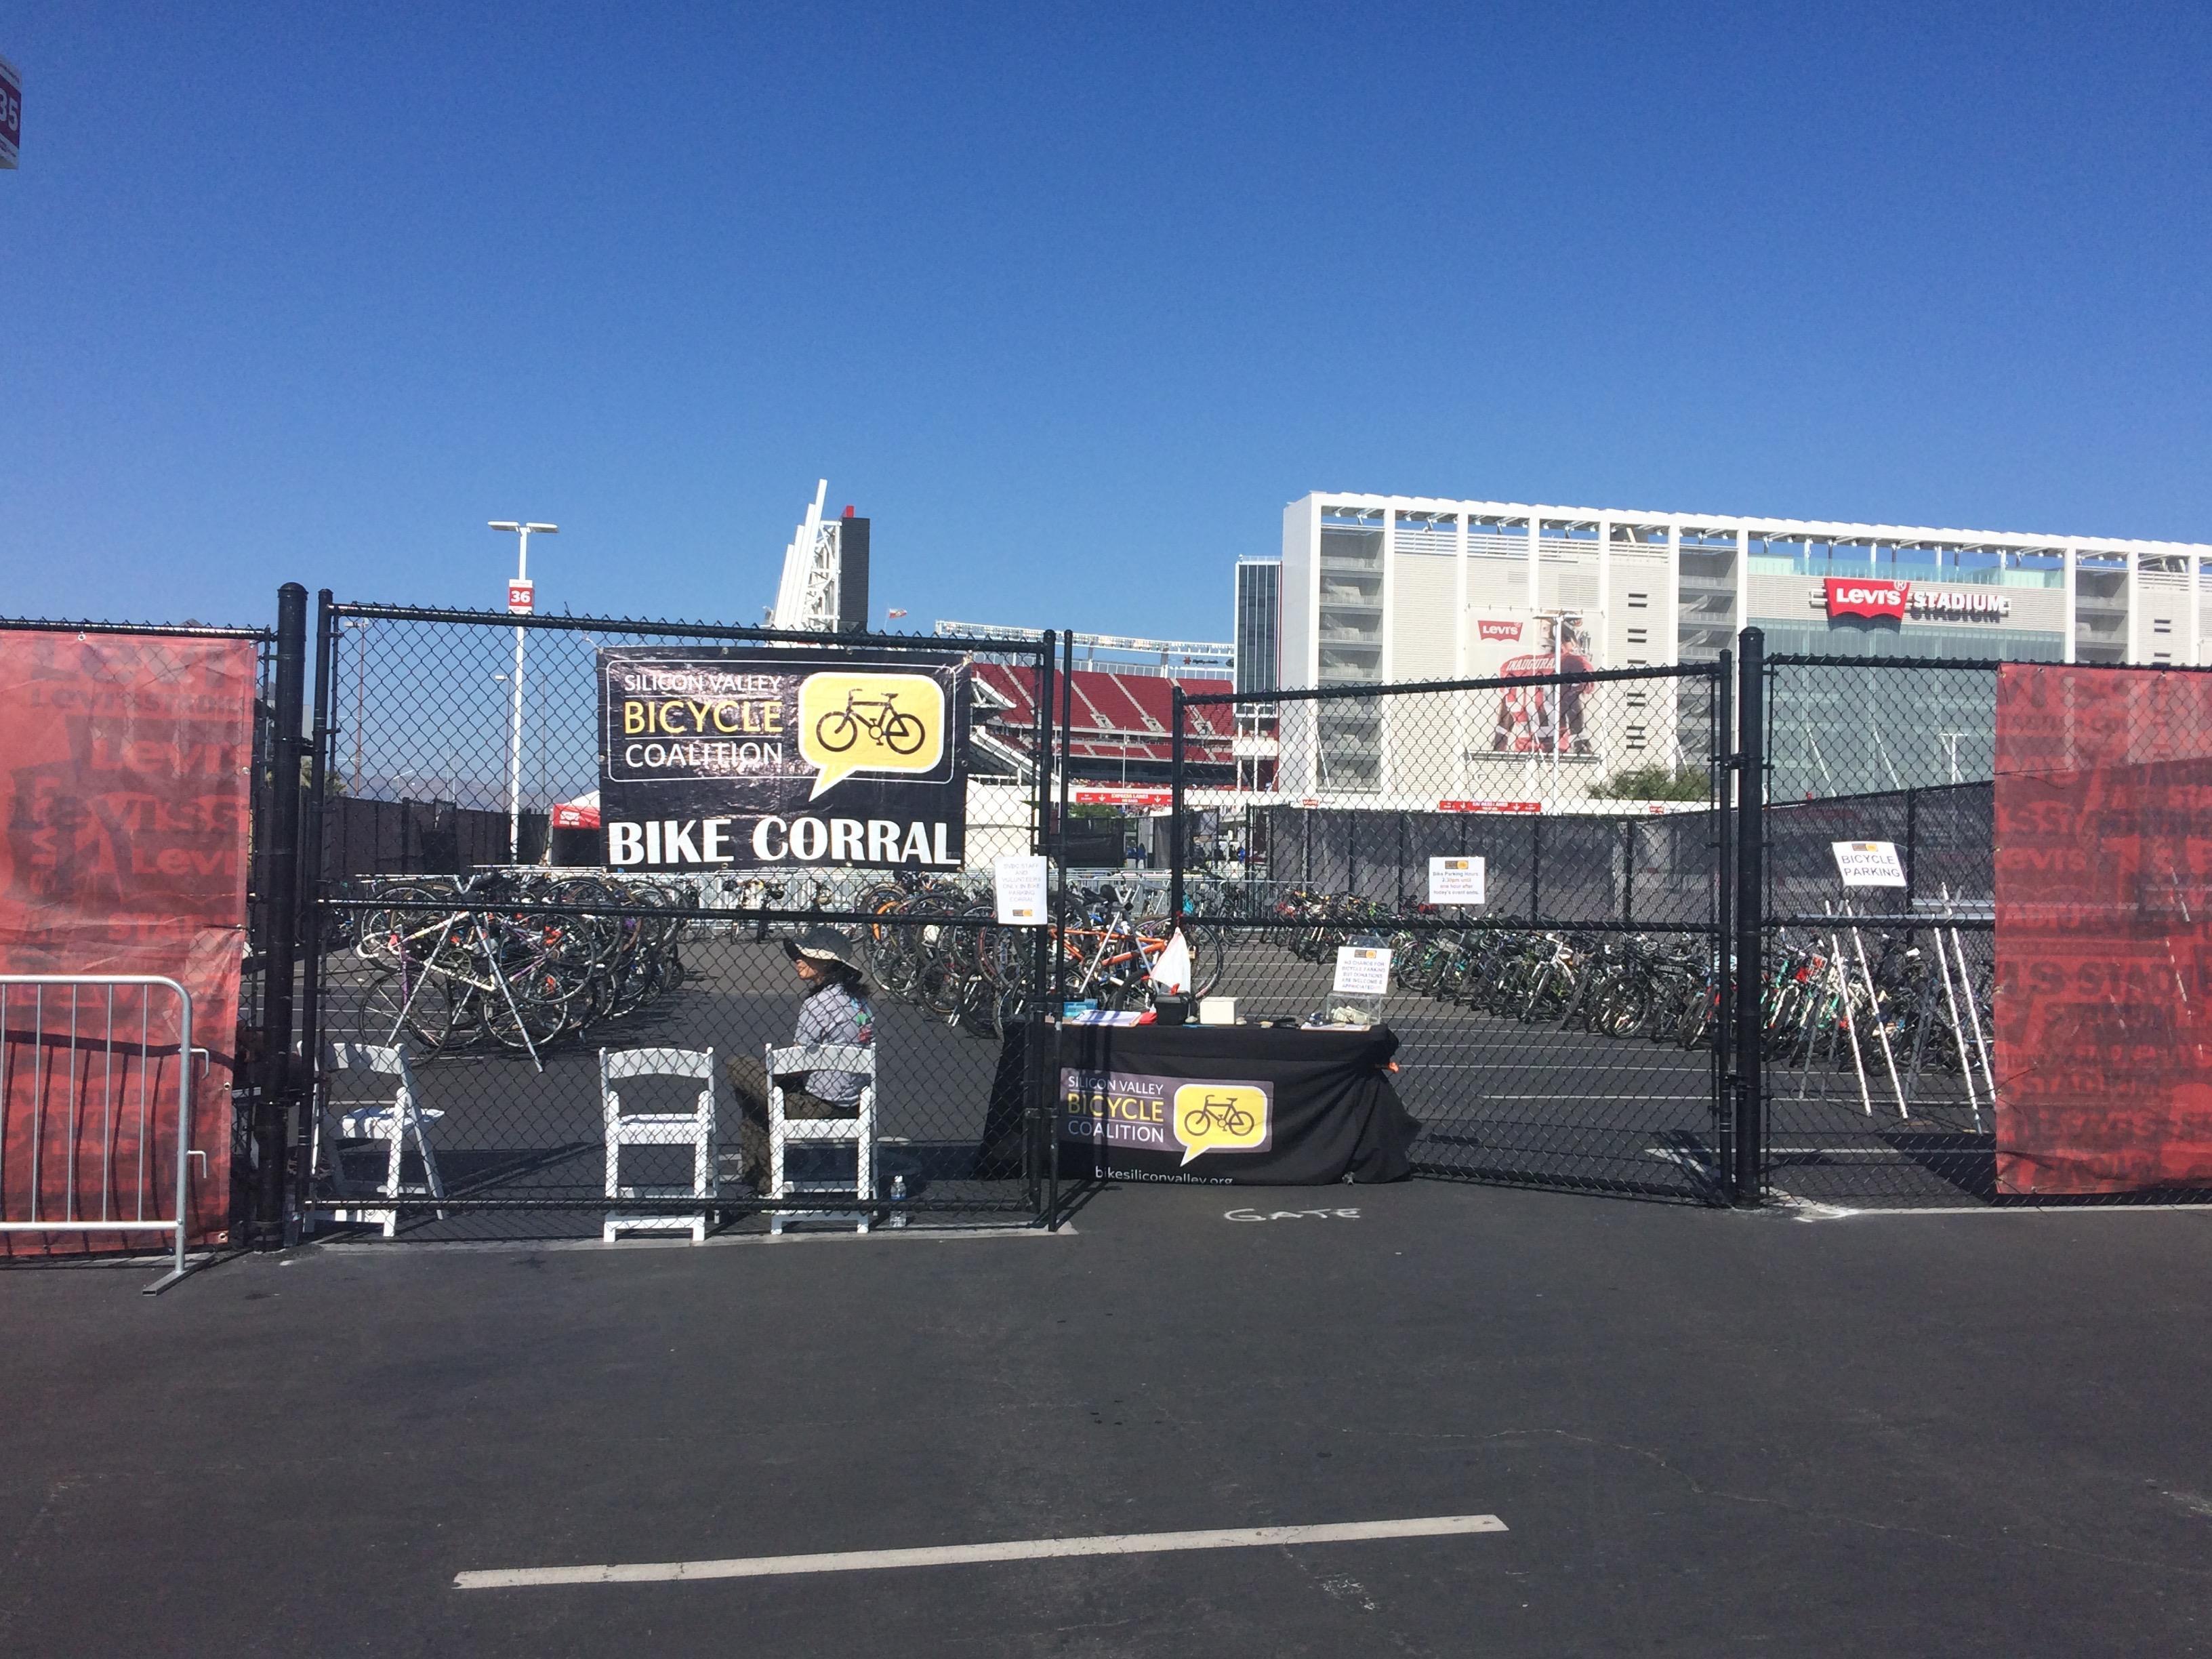 Volunteer for Bike Parking at Levi's Stadium